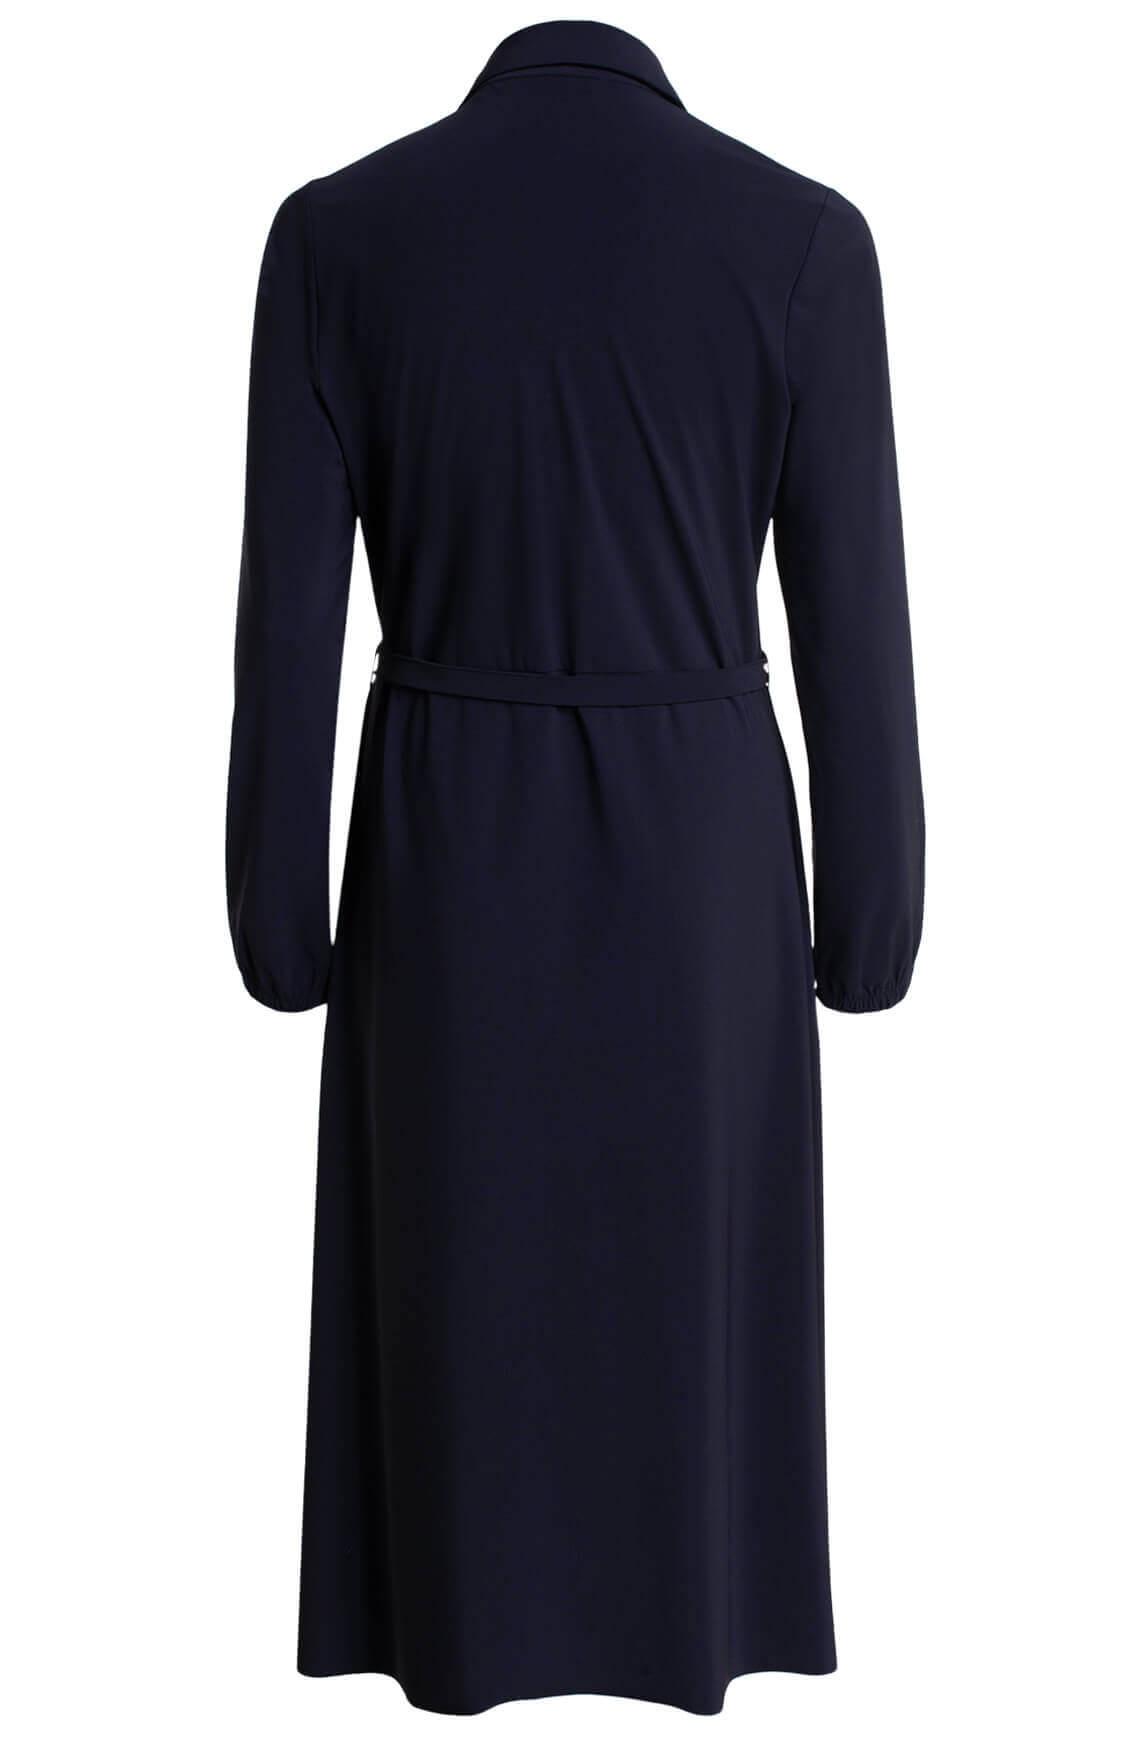 Moscow Dames Nika jurk Blauw